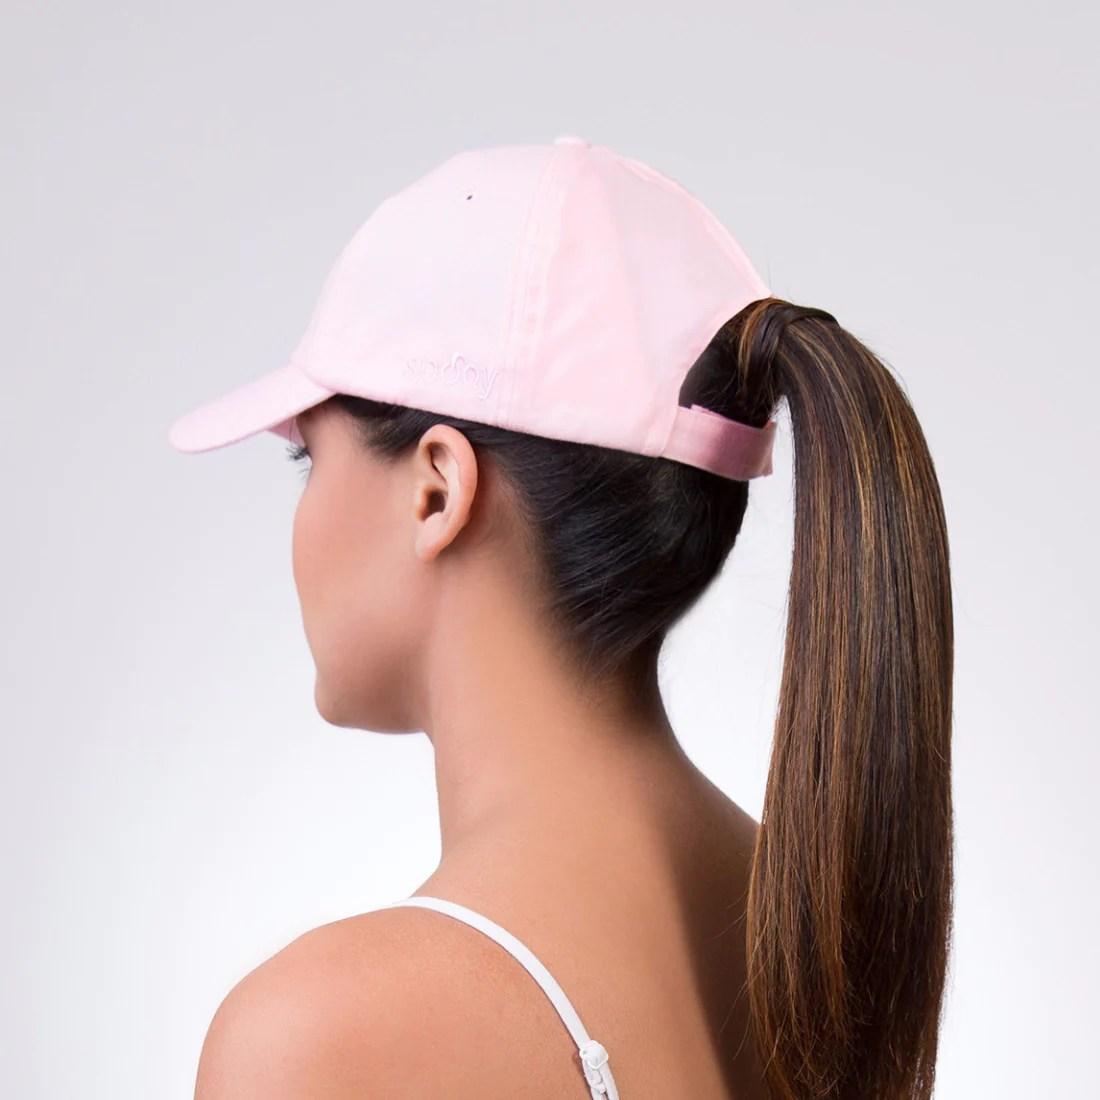 spony ponytail baseball cap - wear